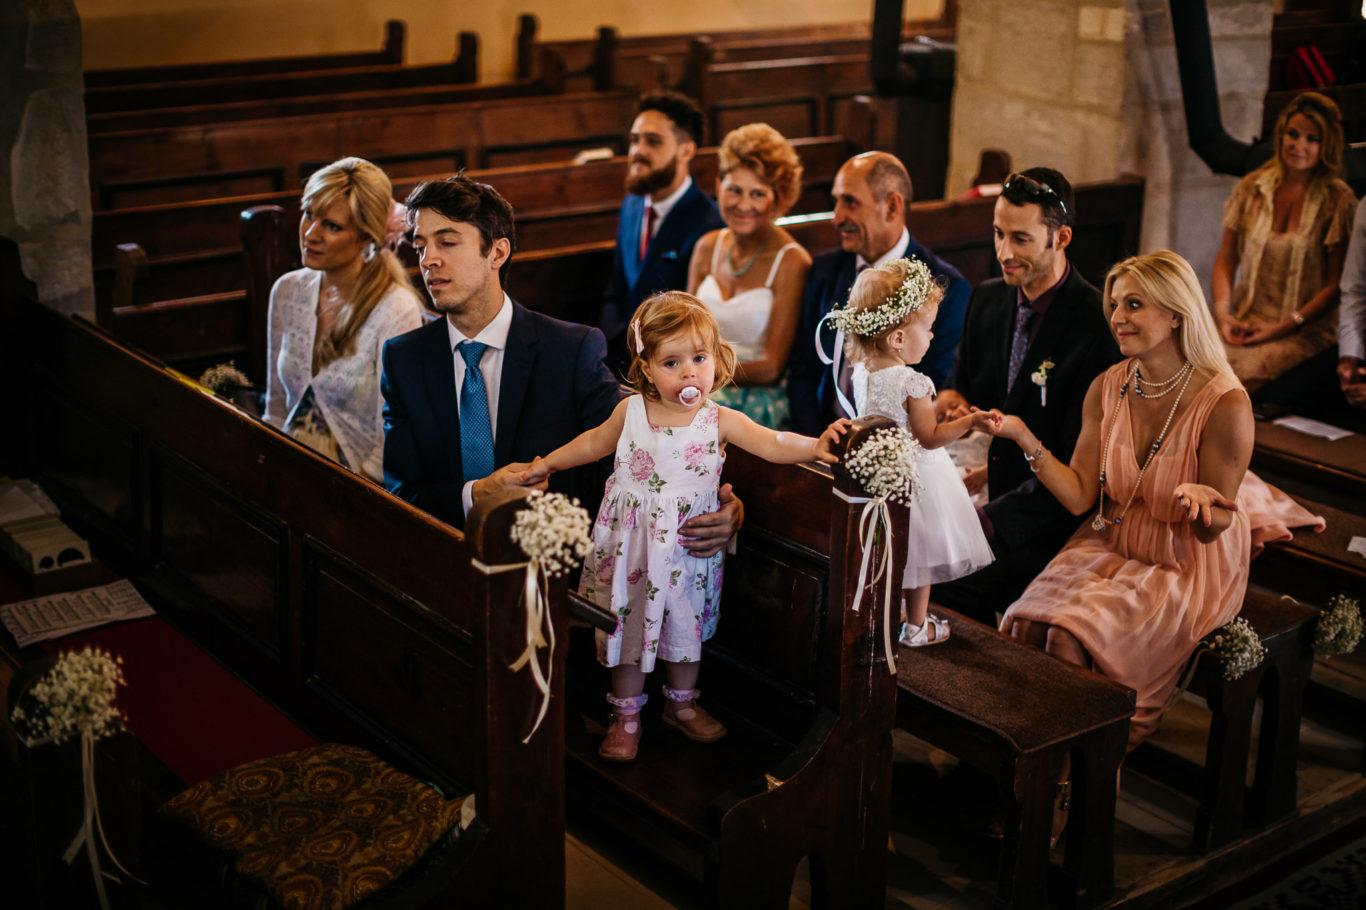 0208-fotografie-nunta-conacul-apafi-ana-simion-fotograf-ciprian-dumitrescu-dc1_1187